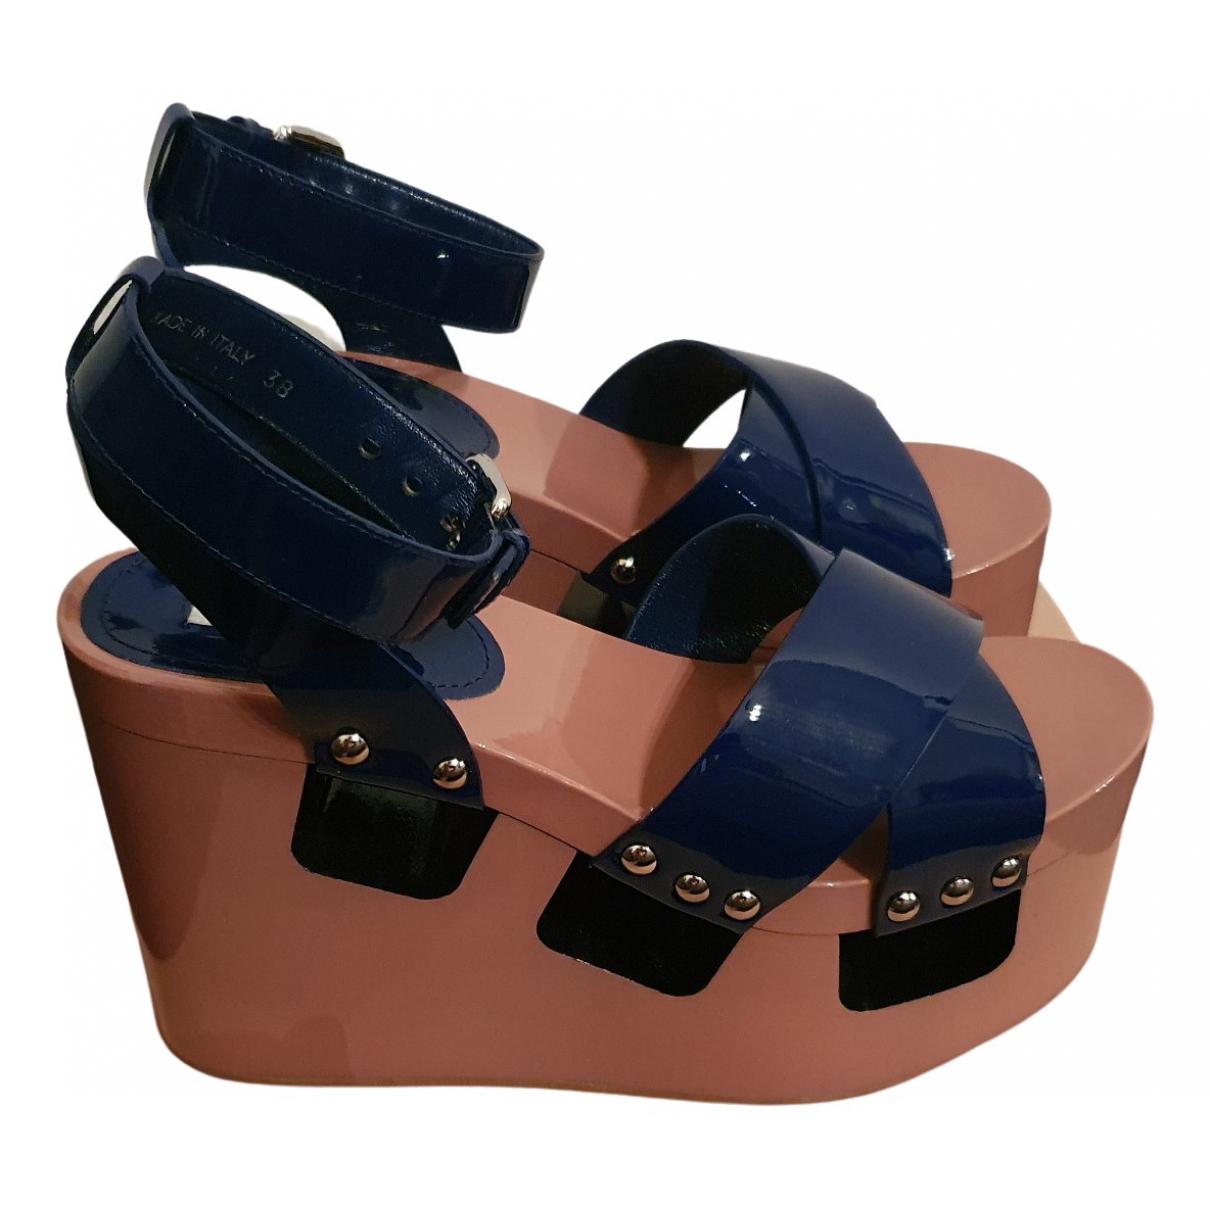 Miu Miu \N Sandalen in  Bunt Lackleder